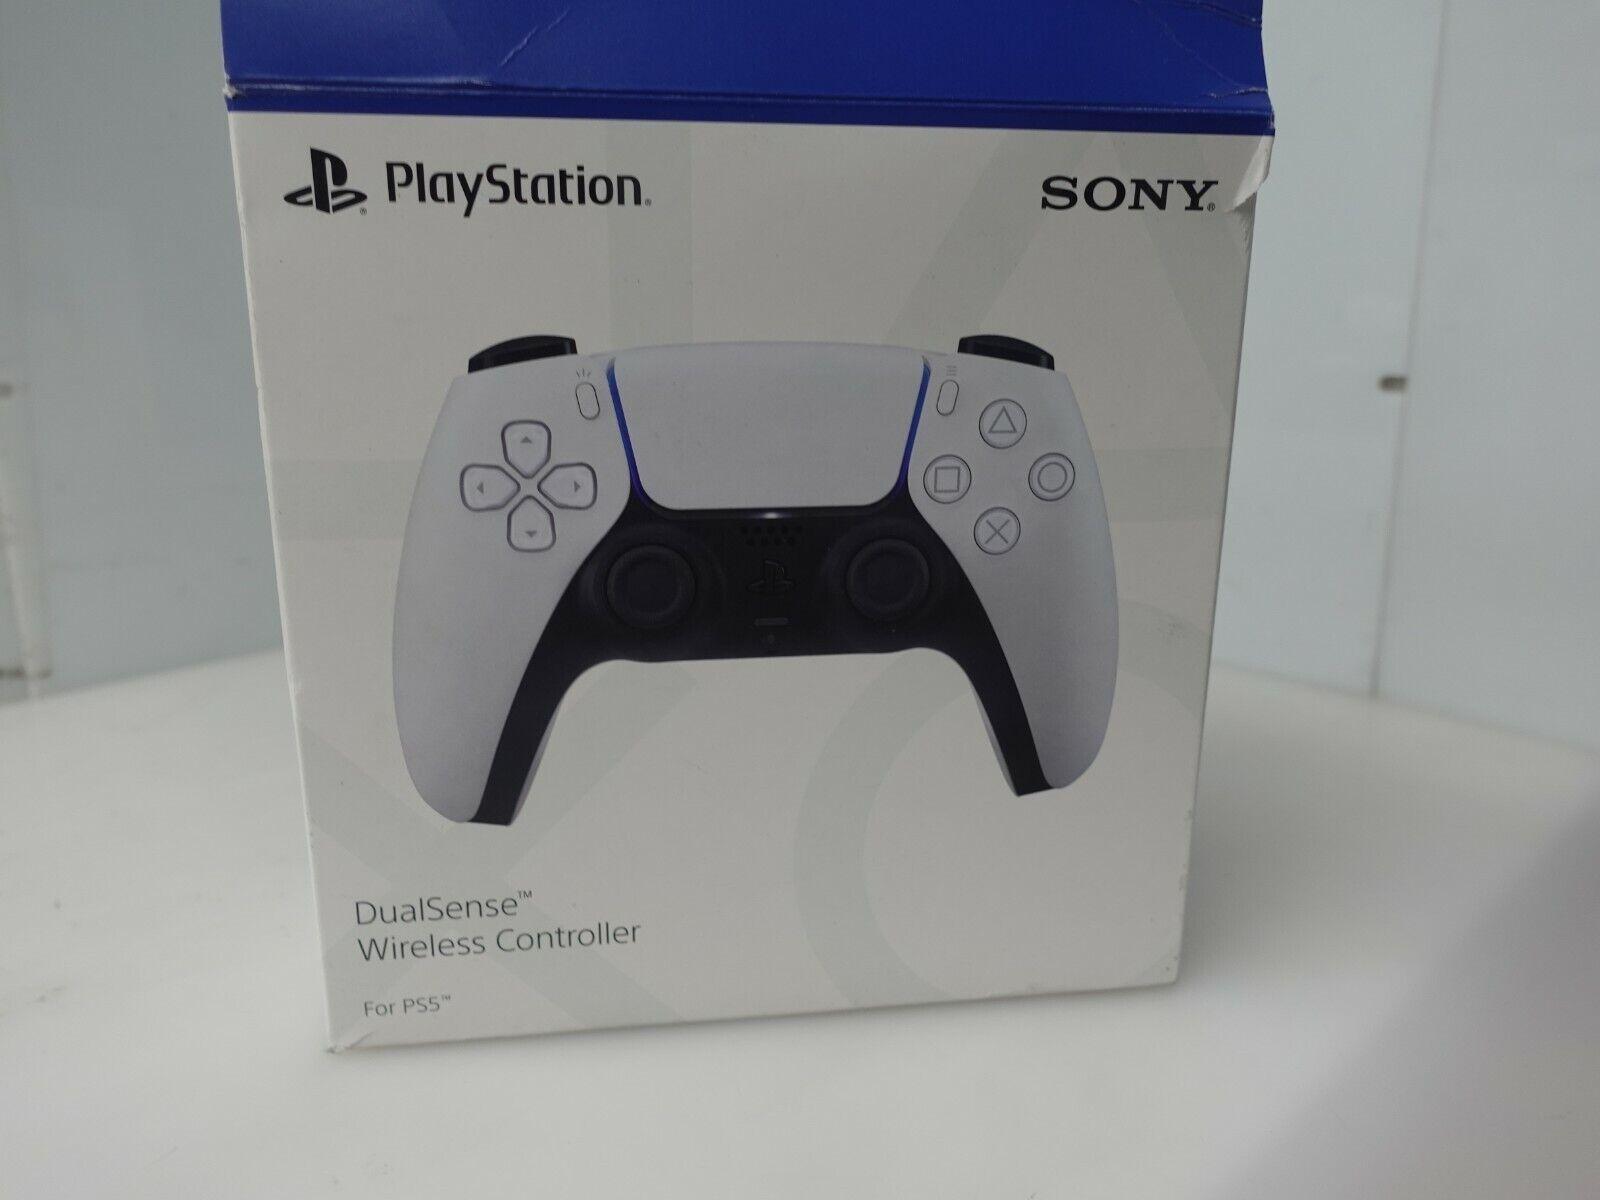 Playstation DualSense Wireless Controller, New - $40.00